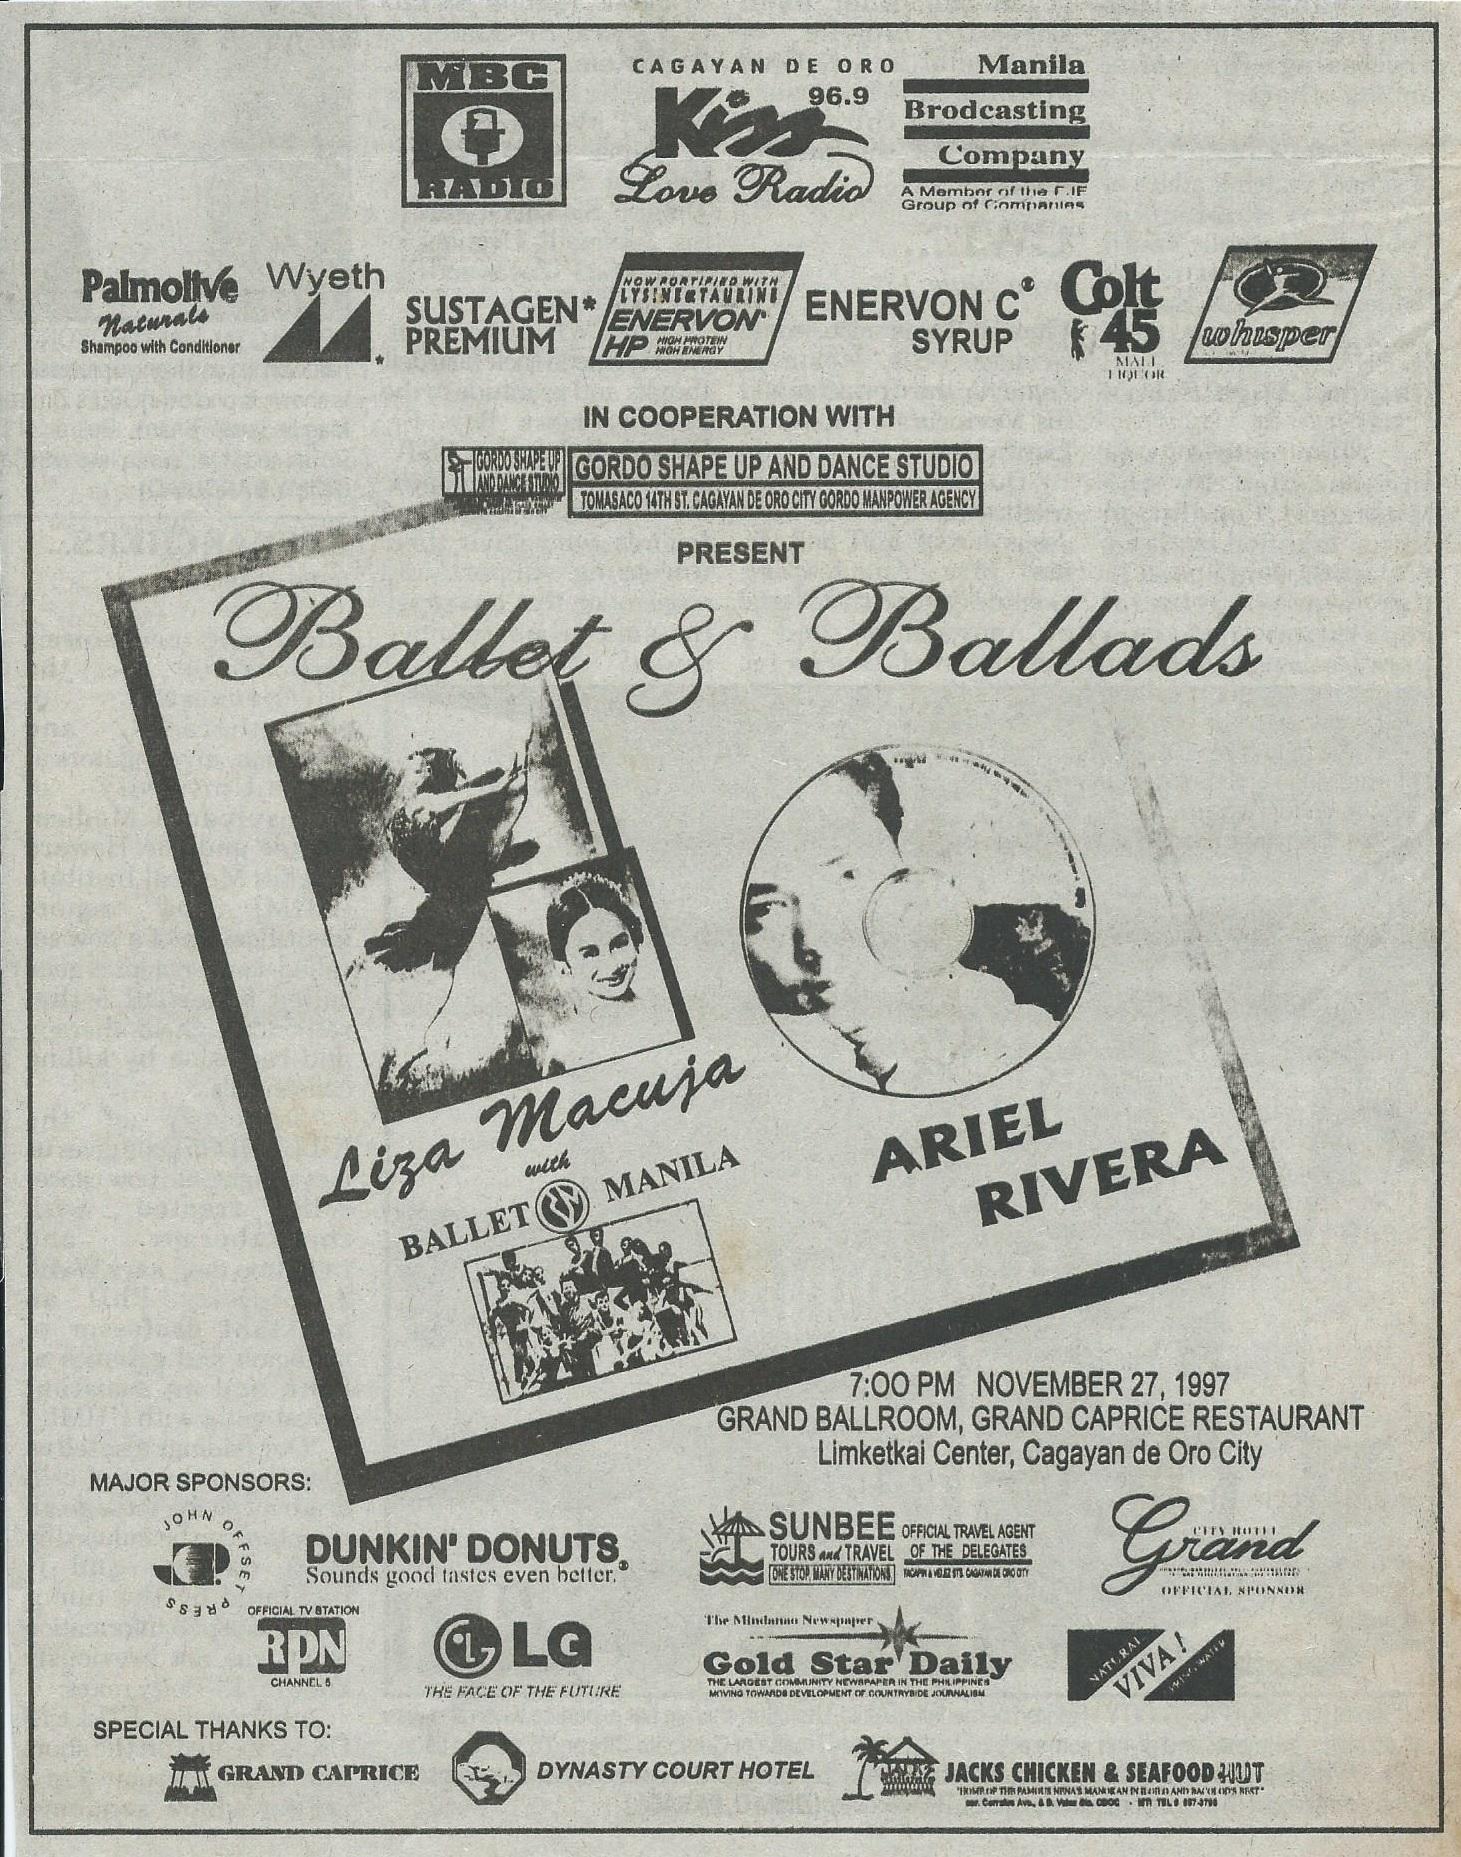 Advertisement for Cagayan de Oro show with Ariel Rivera, 1997